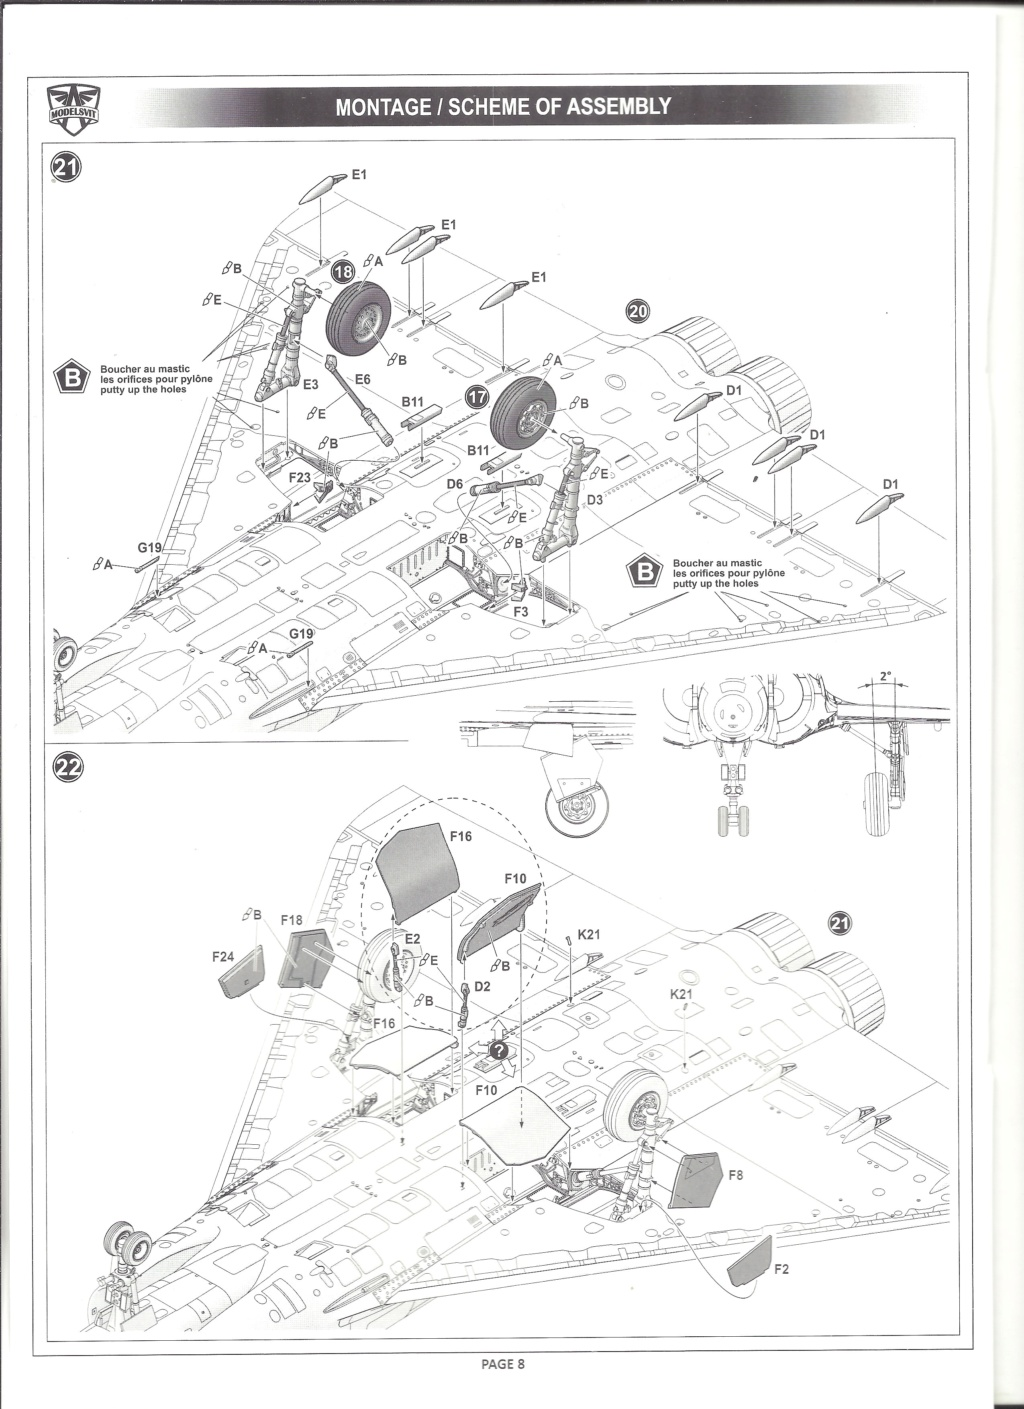 [MODELSVIT] DASSAULT MIRAGE 4000 1/72ème Réf 72052 Notice Models19